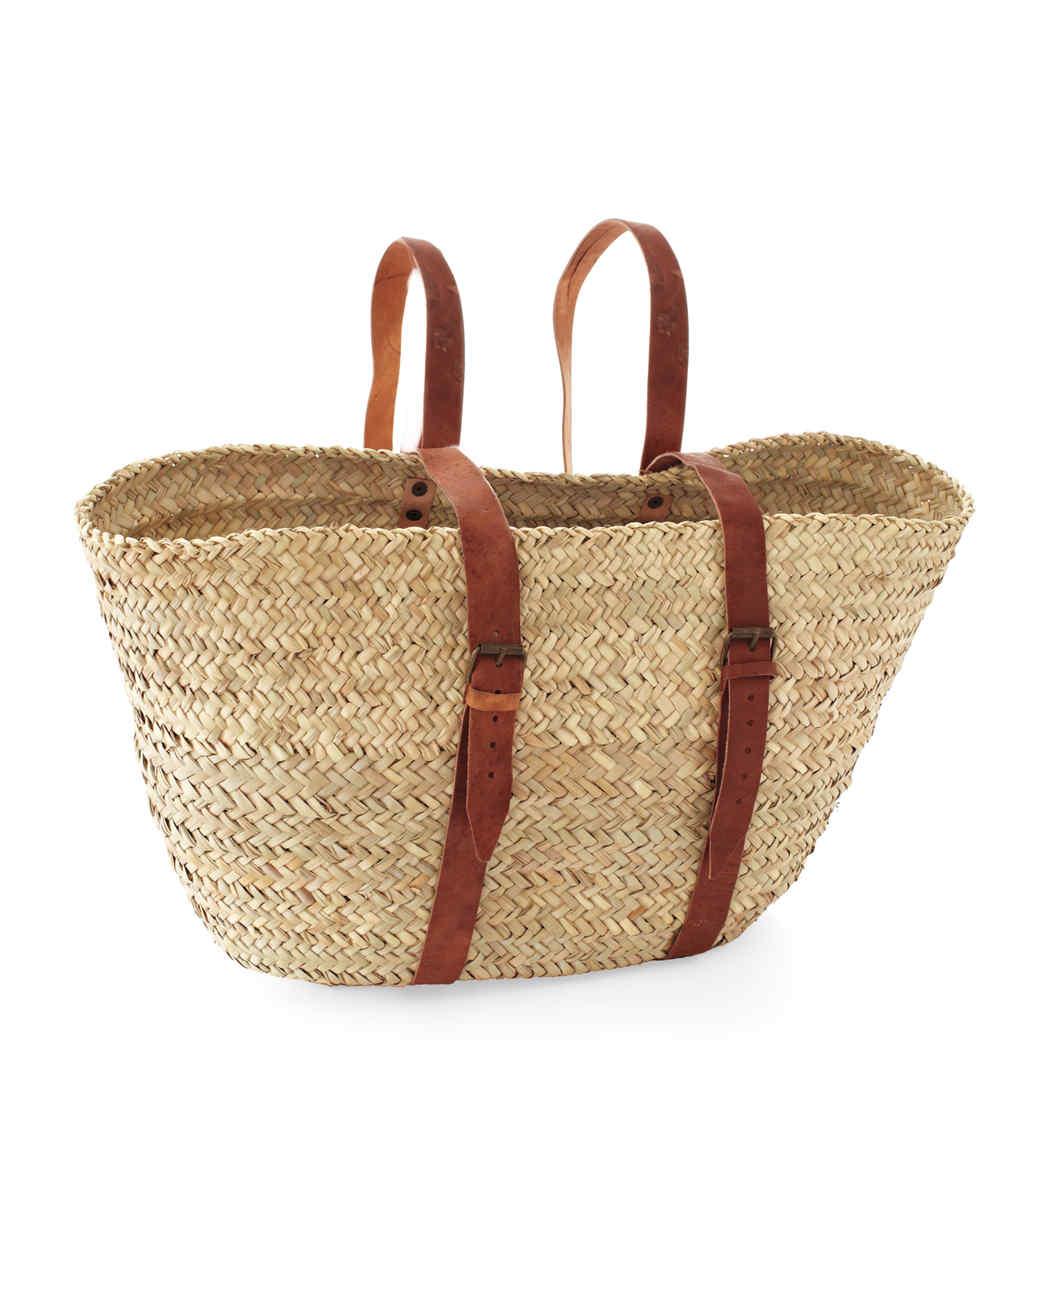 straw-basket-mld108683.jpg